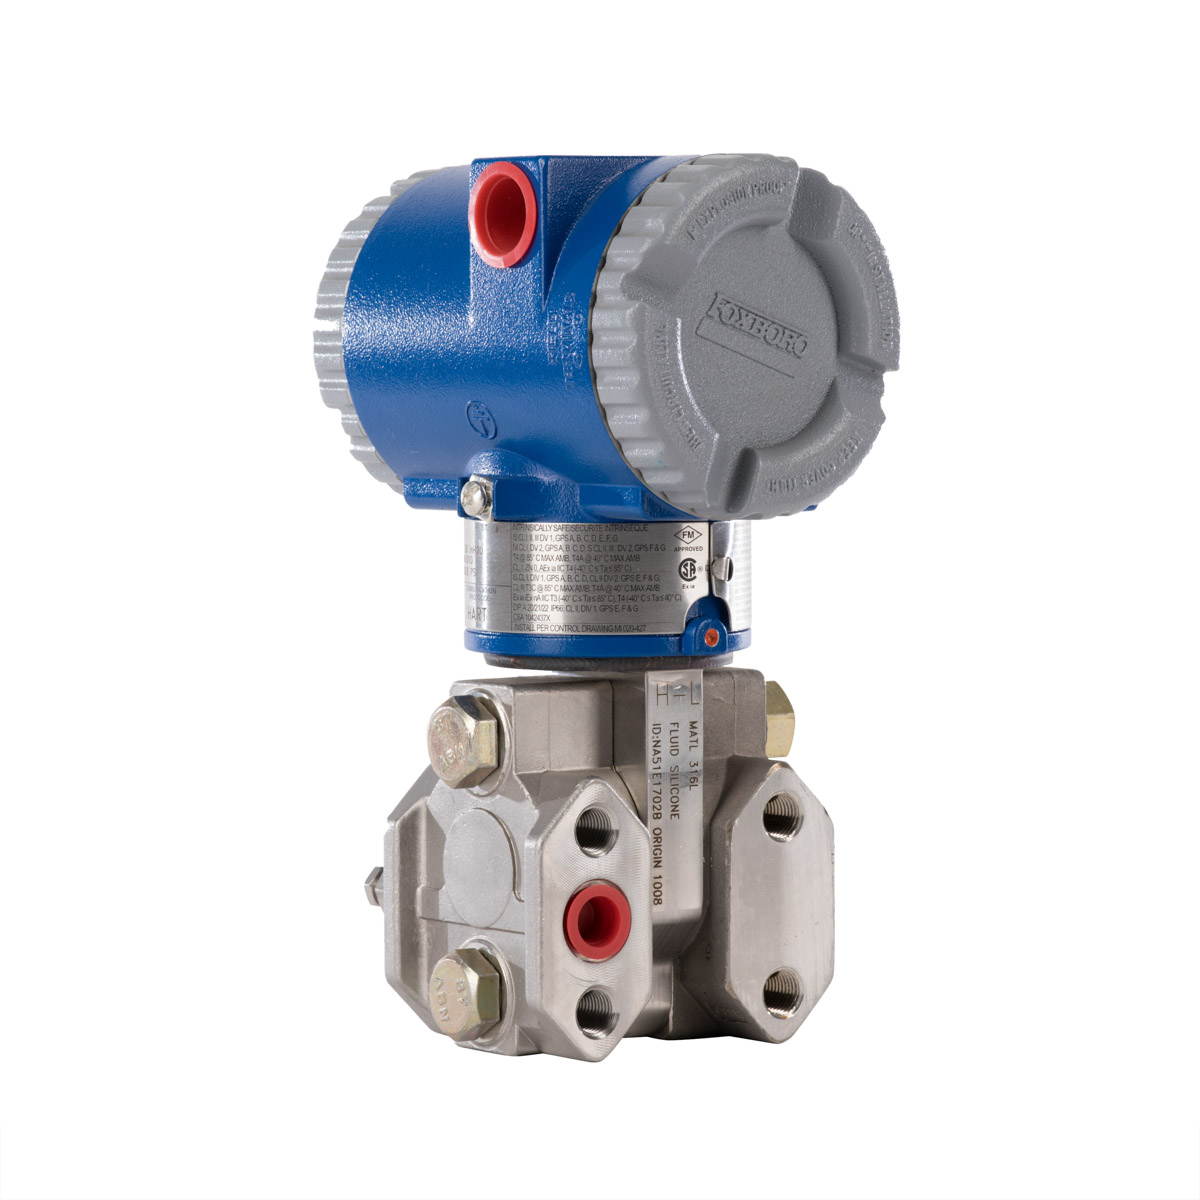 Foxboro IAP20 Absolute Pressure Transmitter